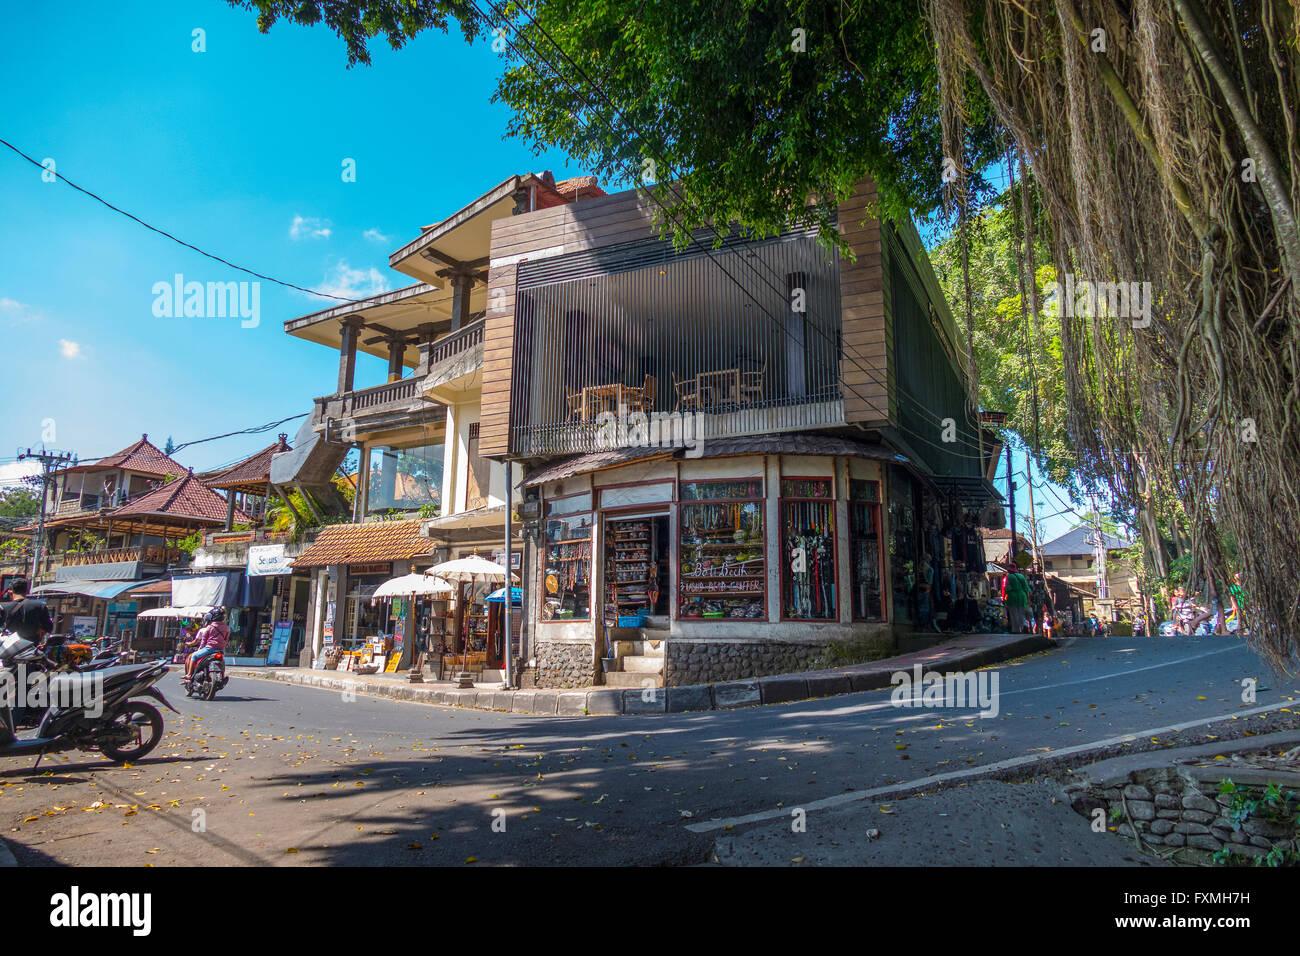 Street View of Ubud, Bali, Indonesia - Stock Image